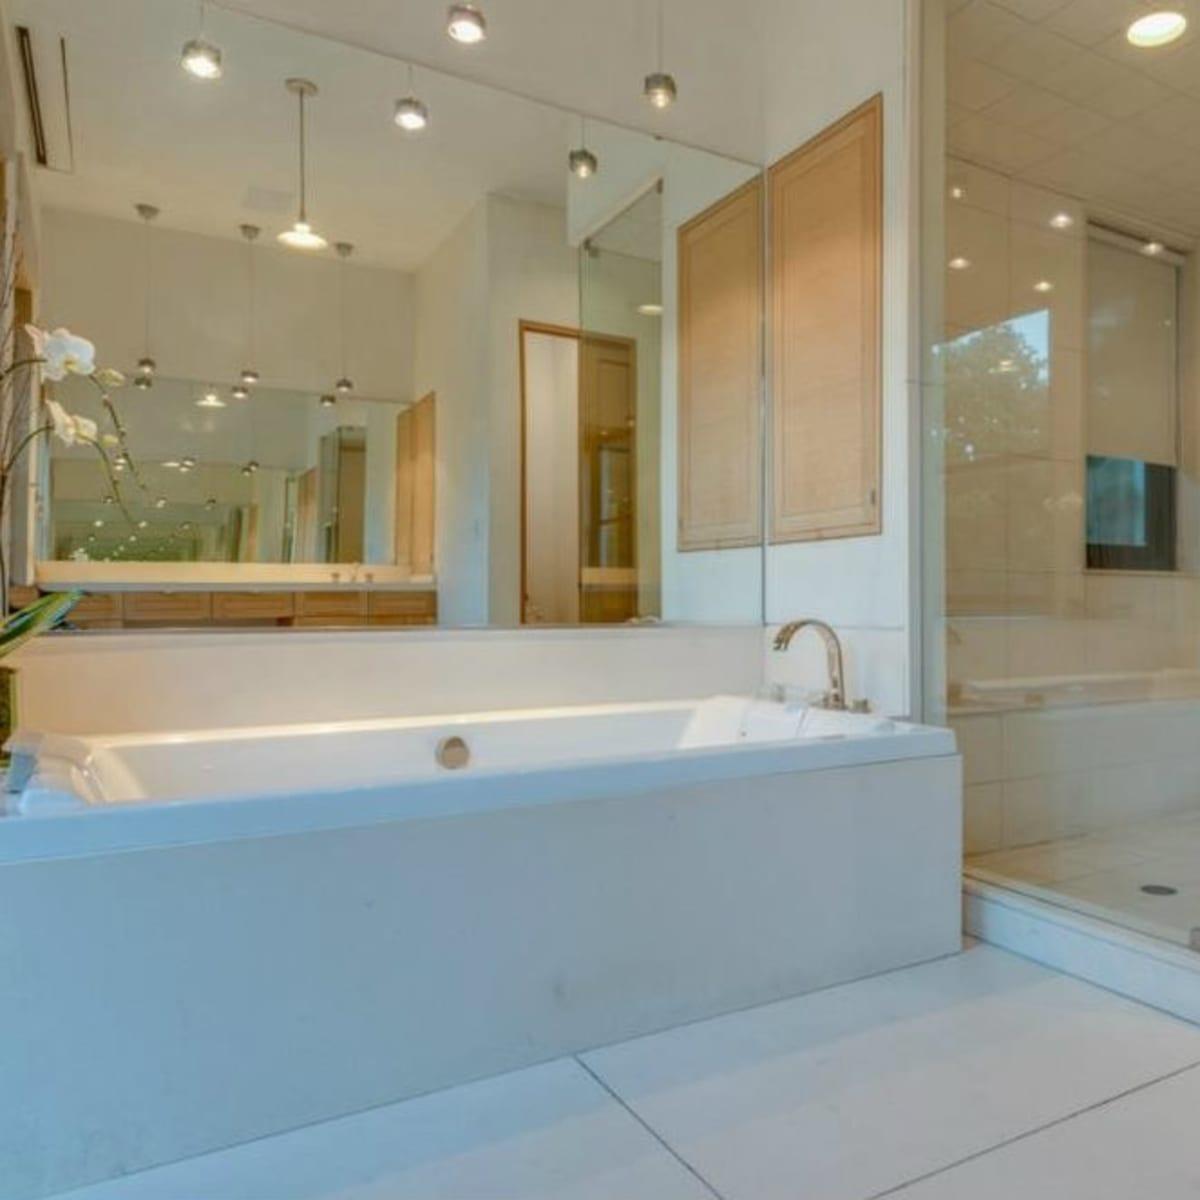 4208 Shenandoah St. house for sale in Dallas